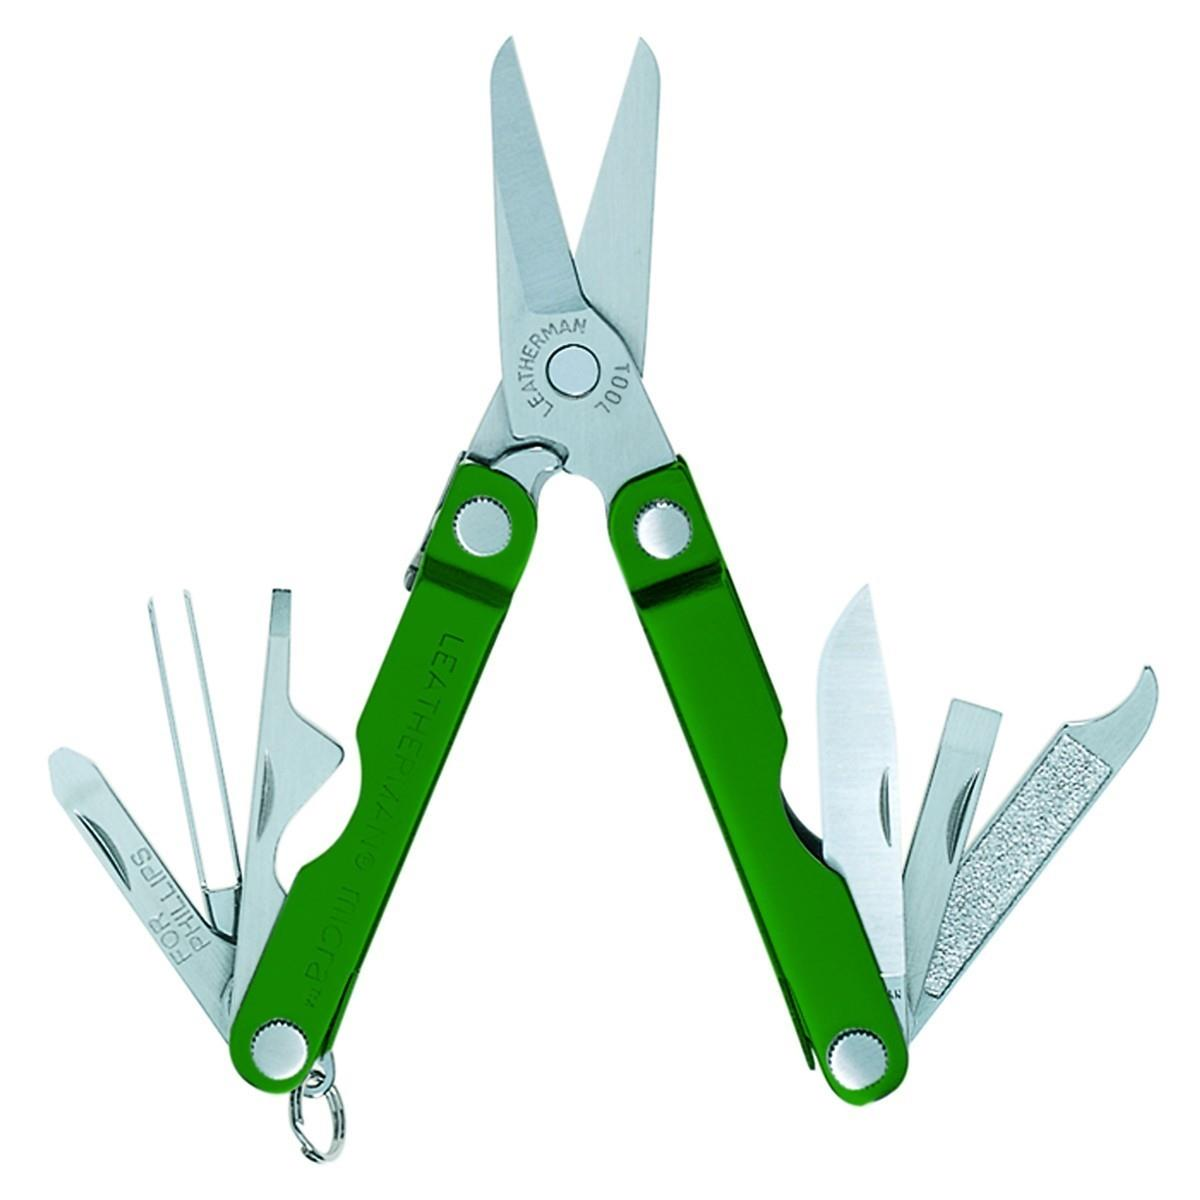 Leatherman Micra Yeşil Aluminium Çok Amaçlı Makas LEA64350181N